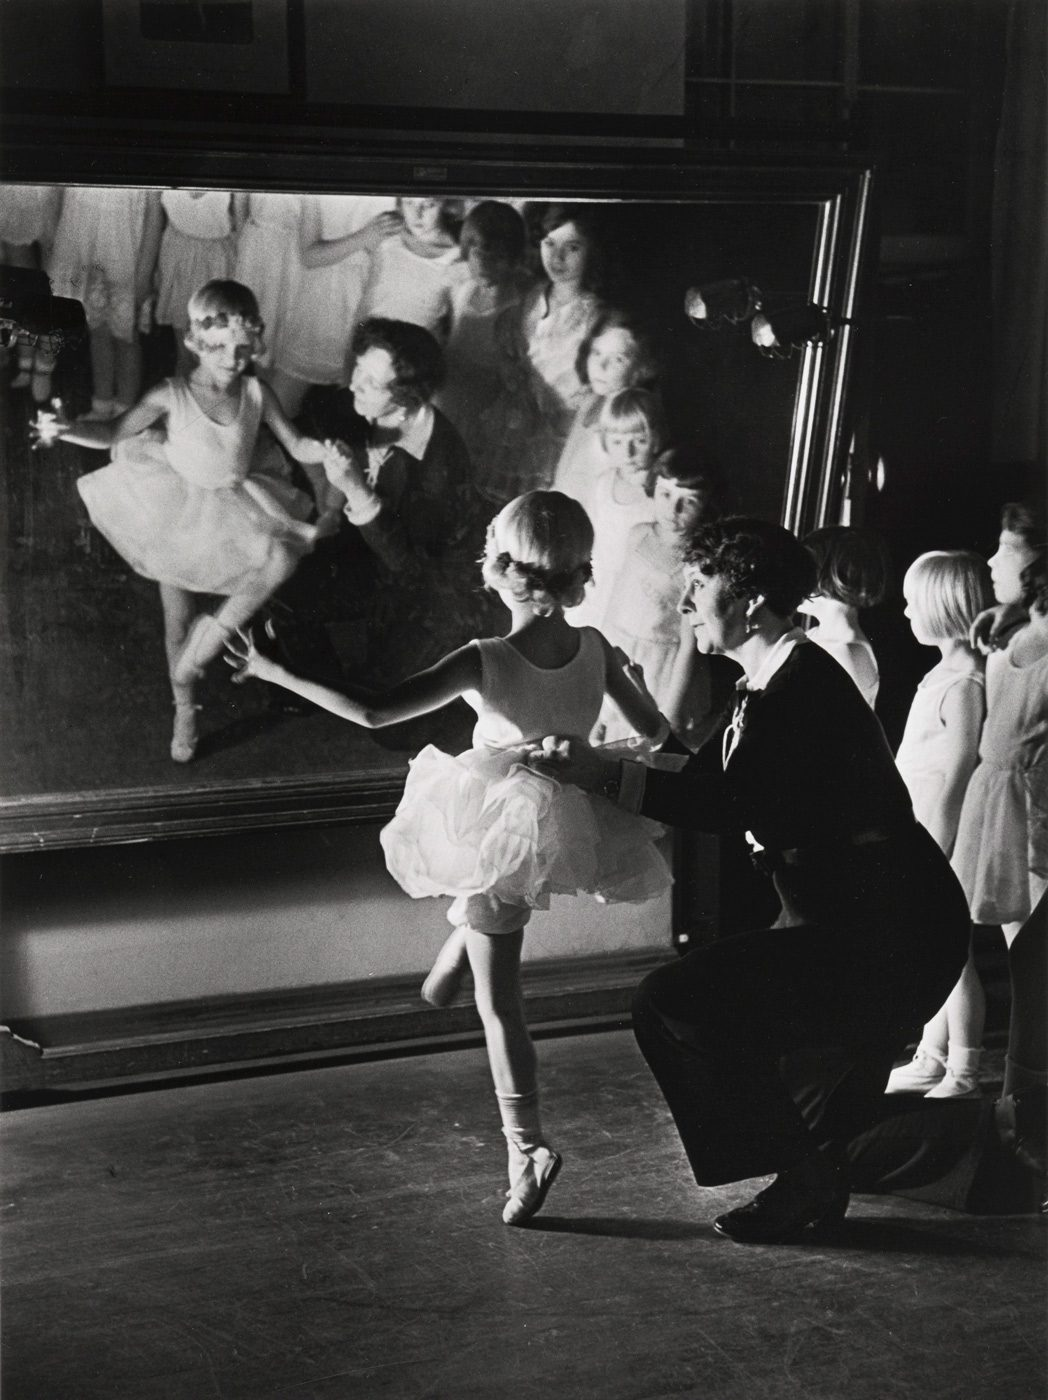 First Lesson at Truempy Ballet School, Berlin